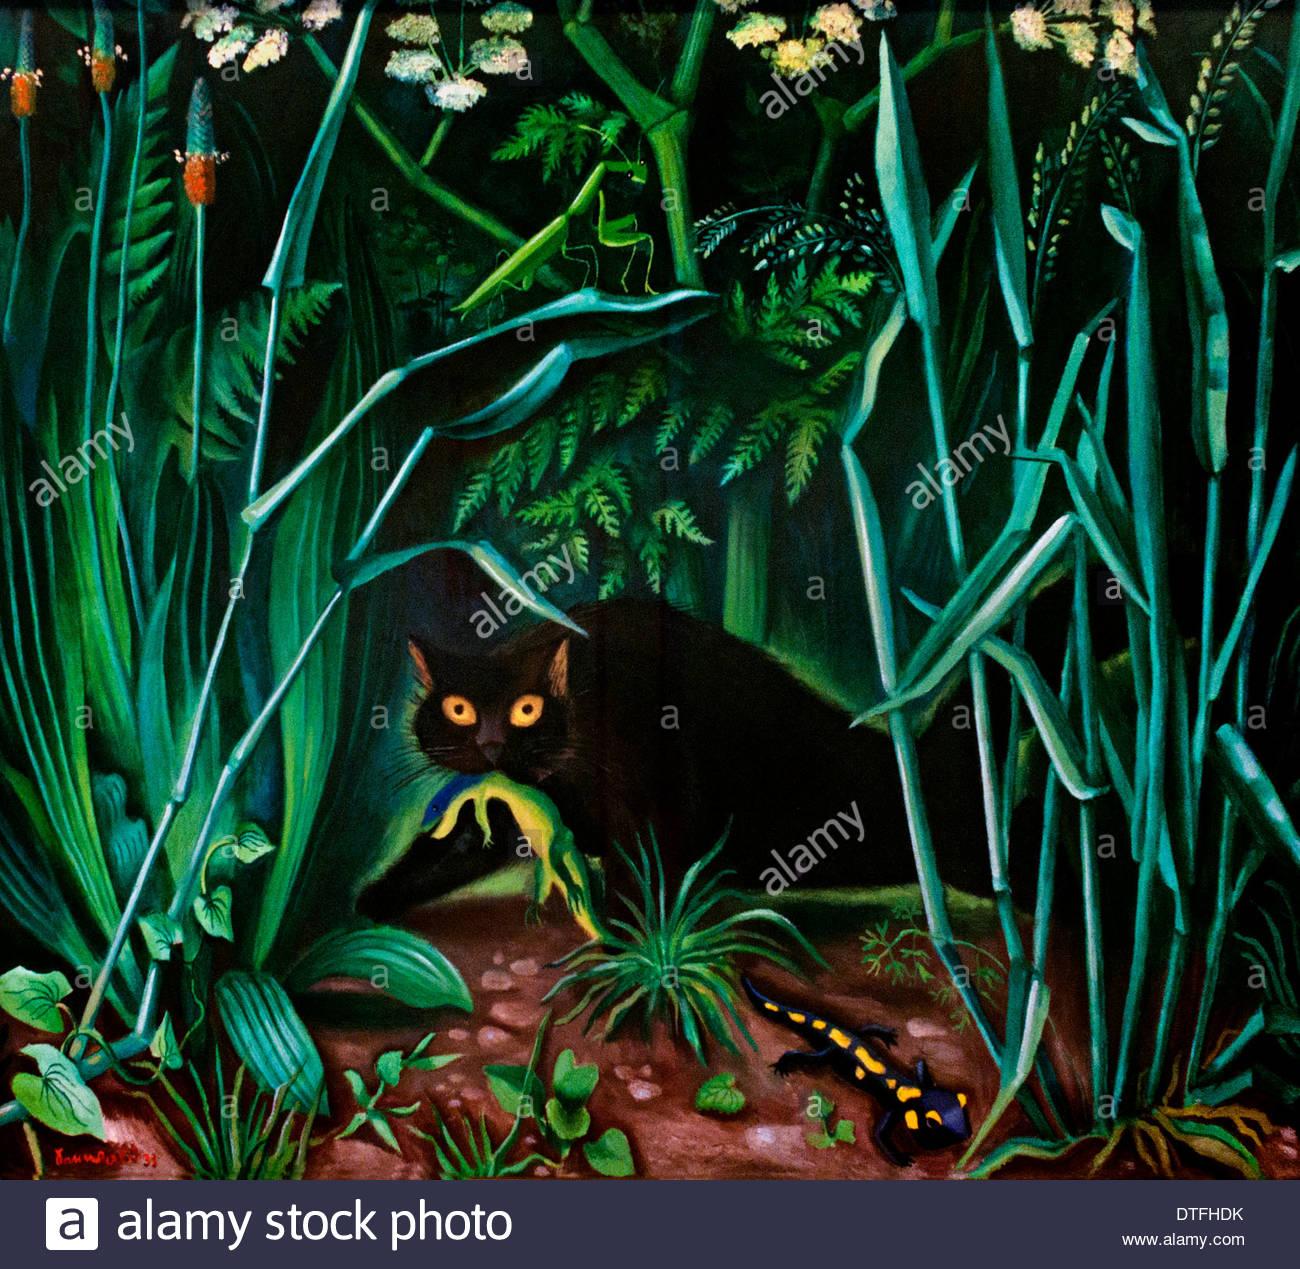 Cat with Salamander Richard Seewald 1889 -1976   German Germany - Stock Image